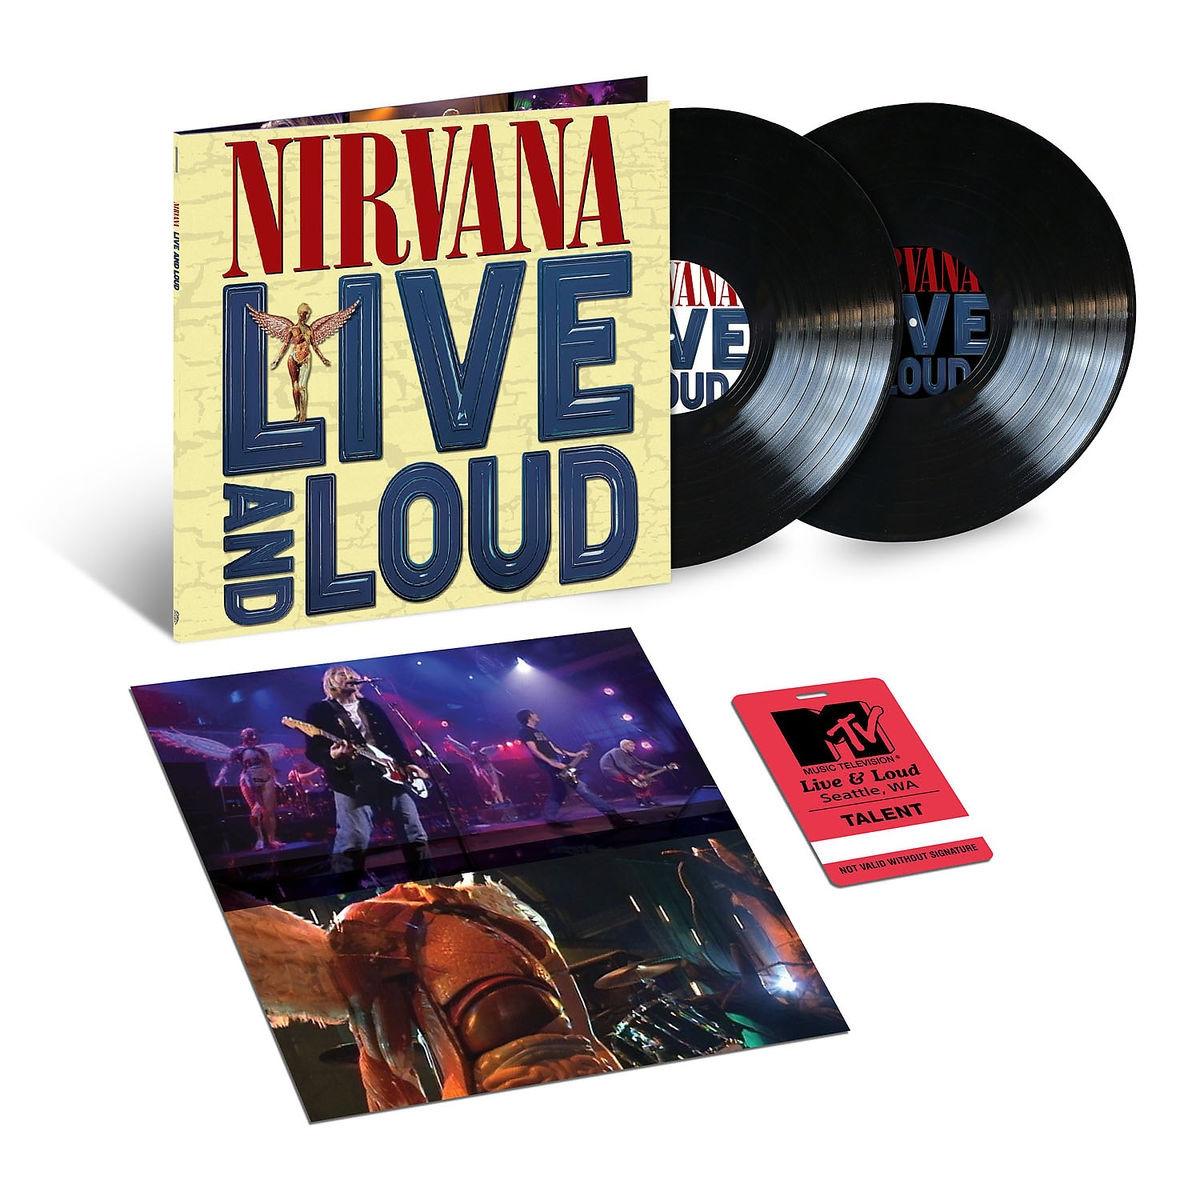 Nirvana - LIVE AND LOUD